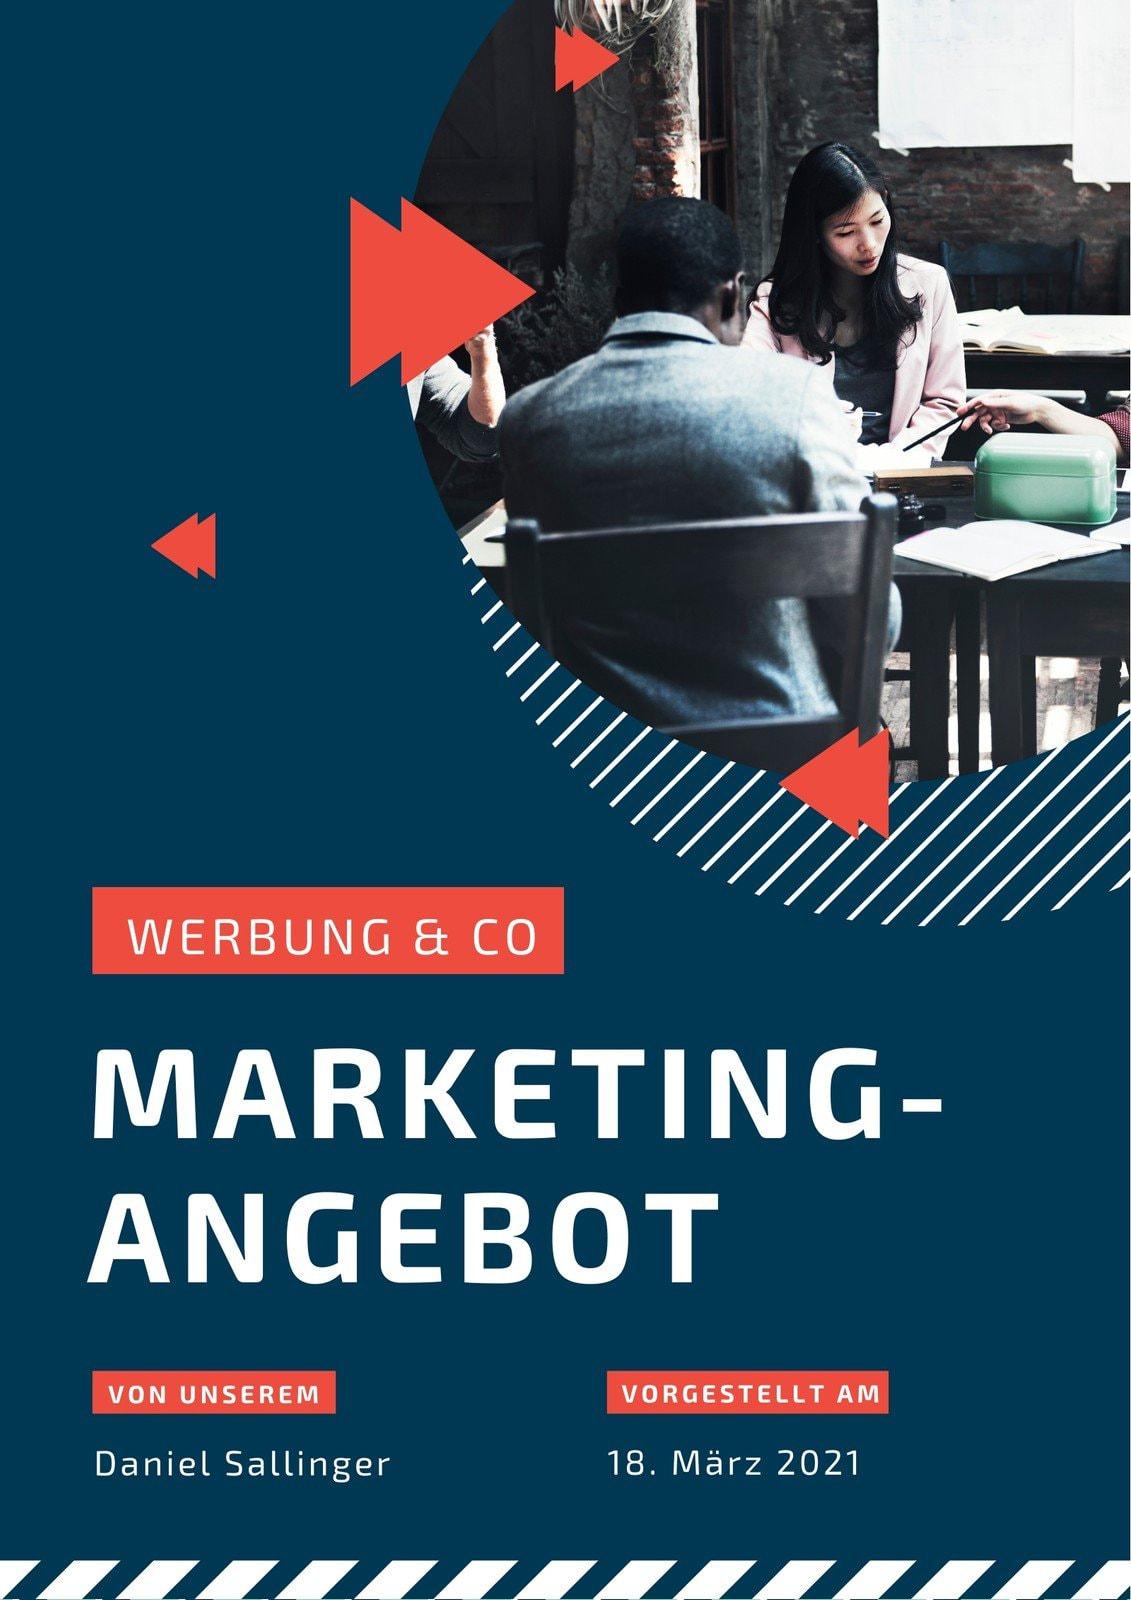 Dunkel Kreis Foto Modern Marketing-Angebot